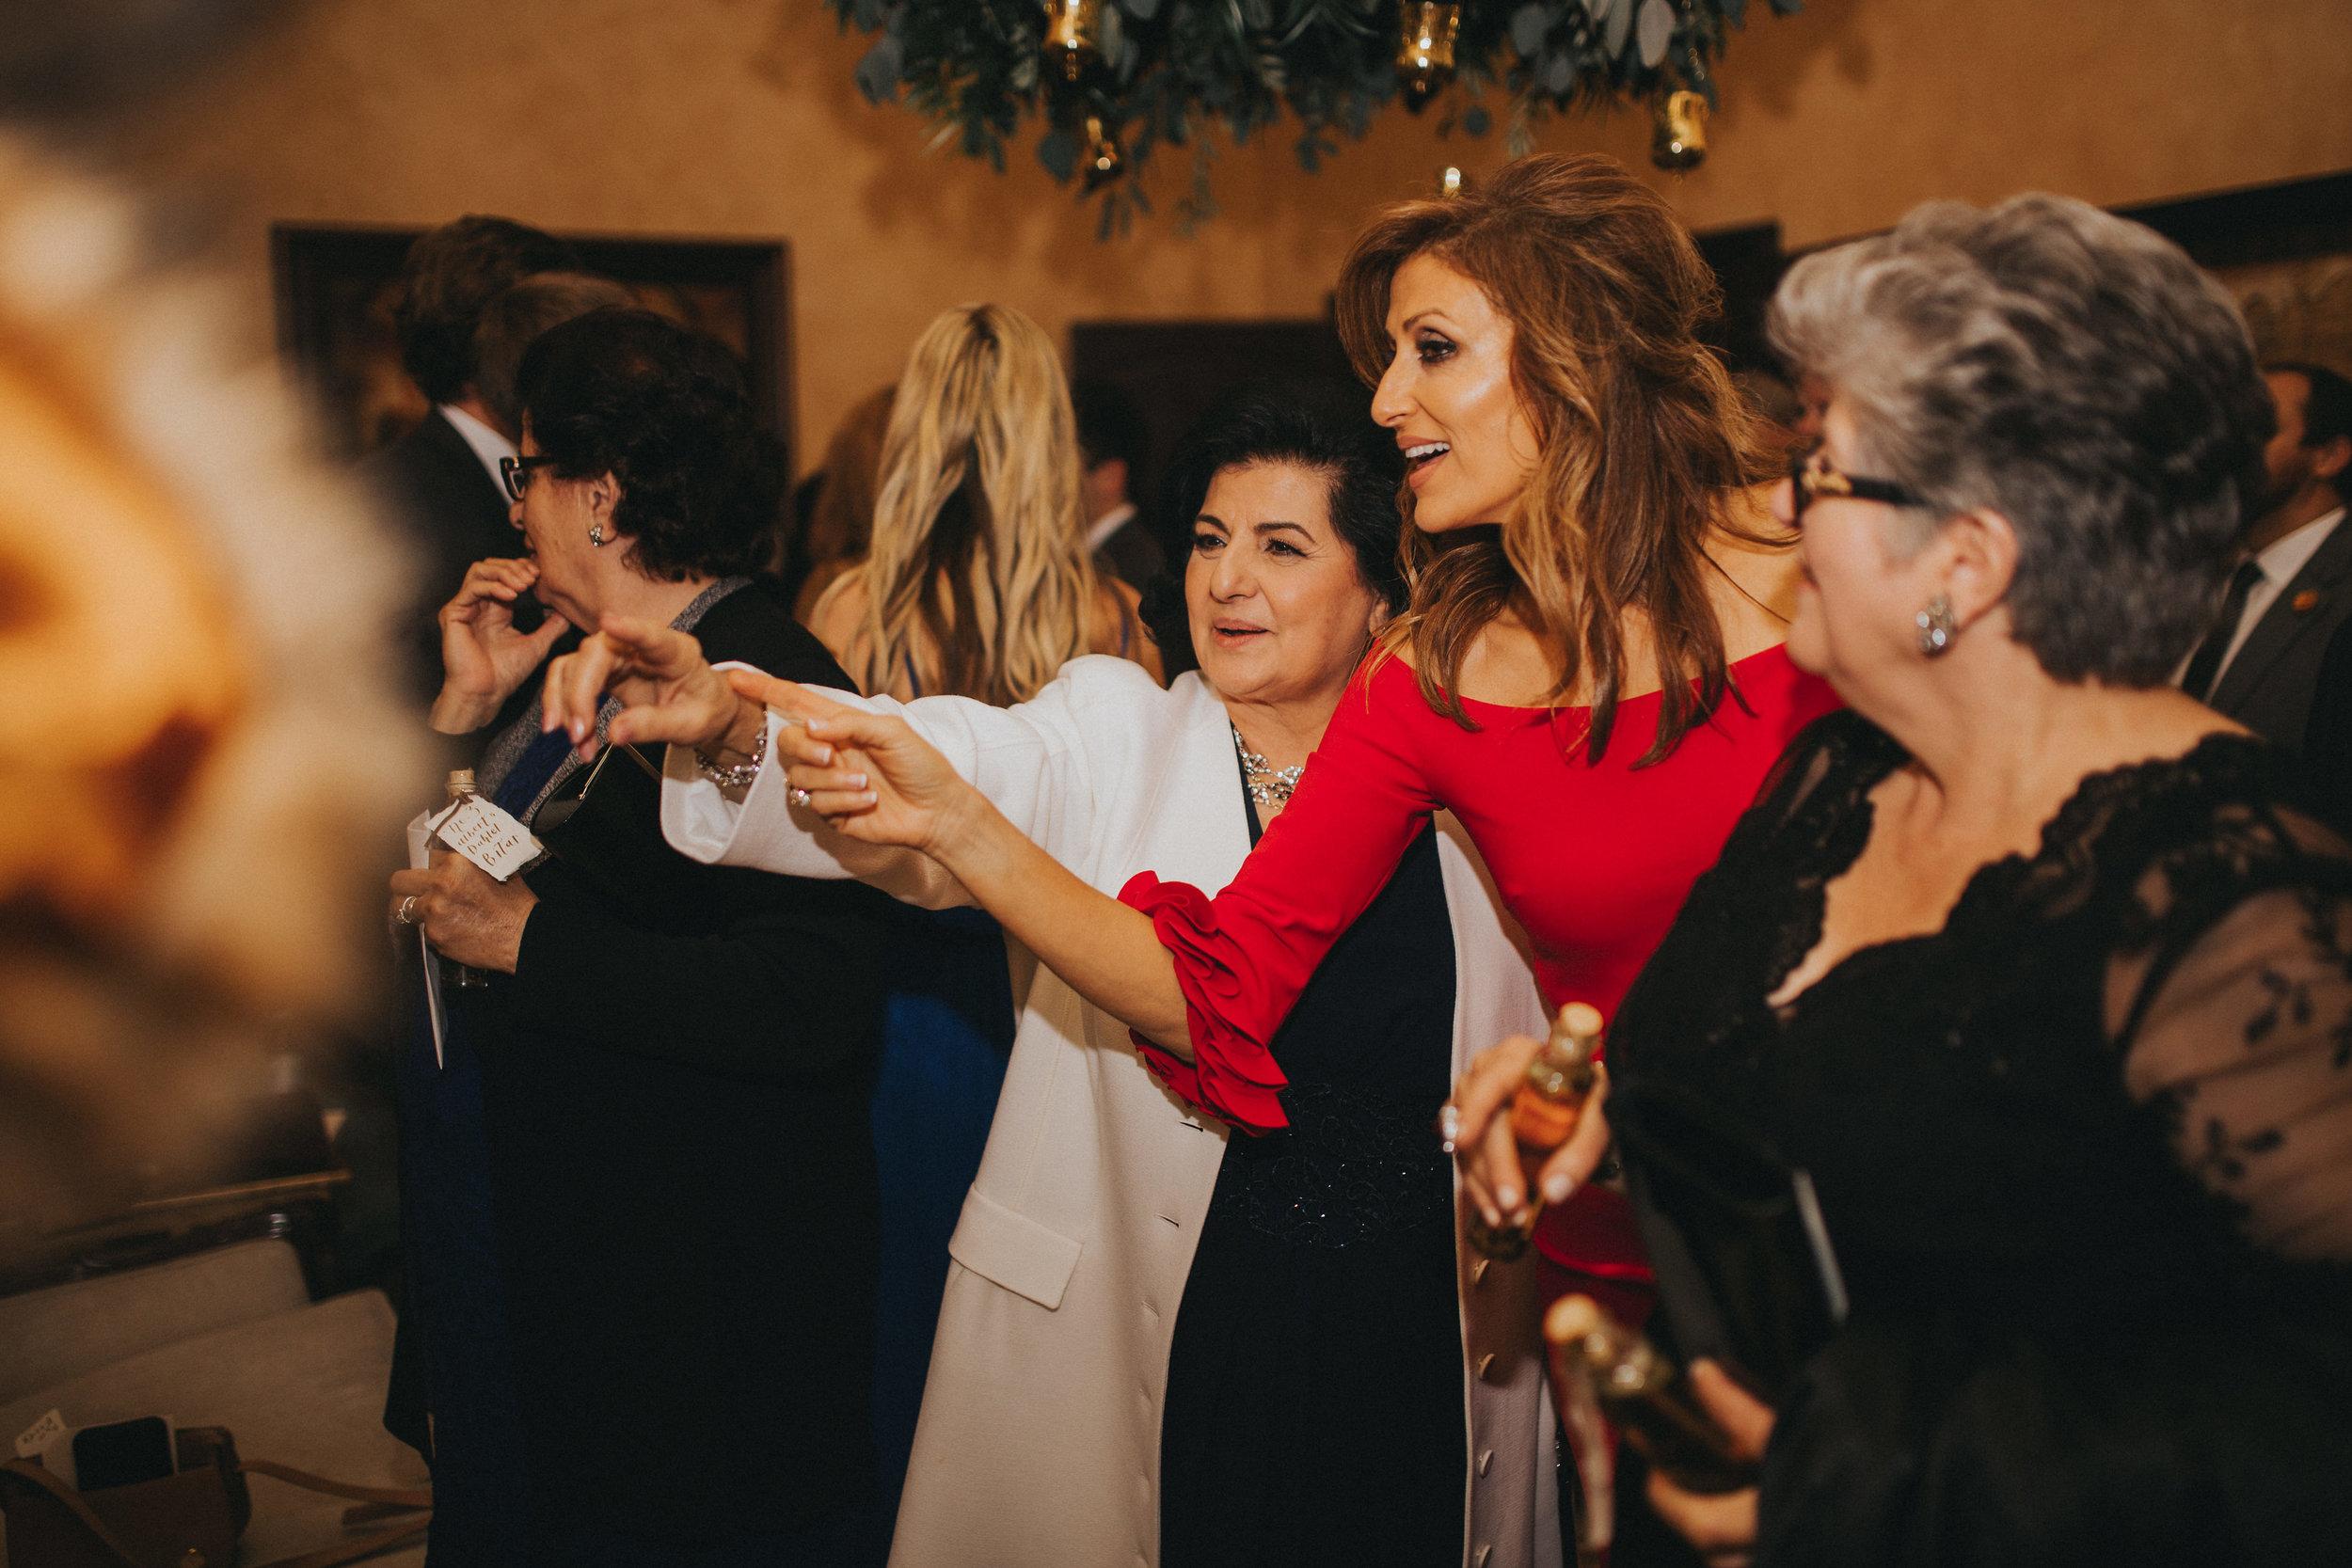 Wedding reception guests at Bella Collina Ballroom